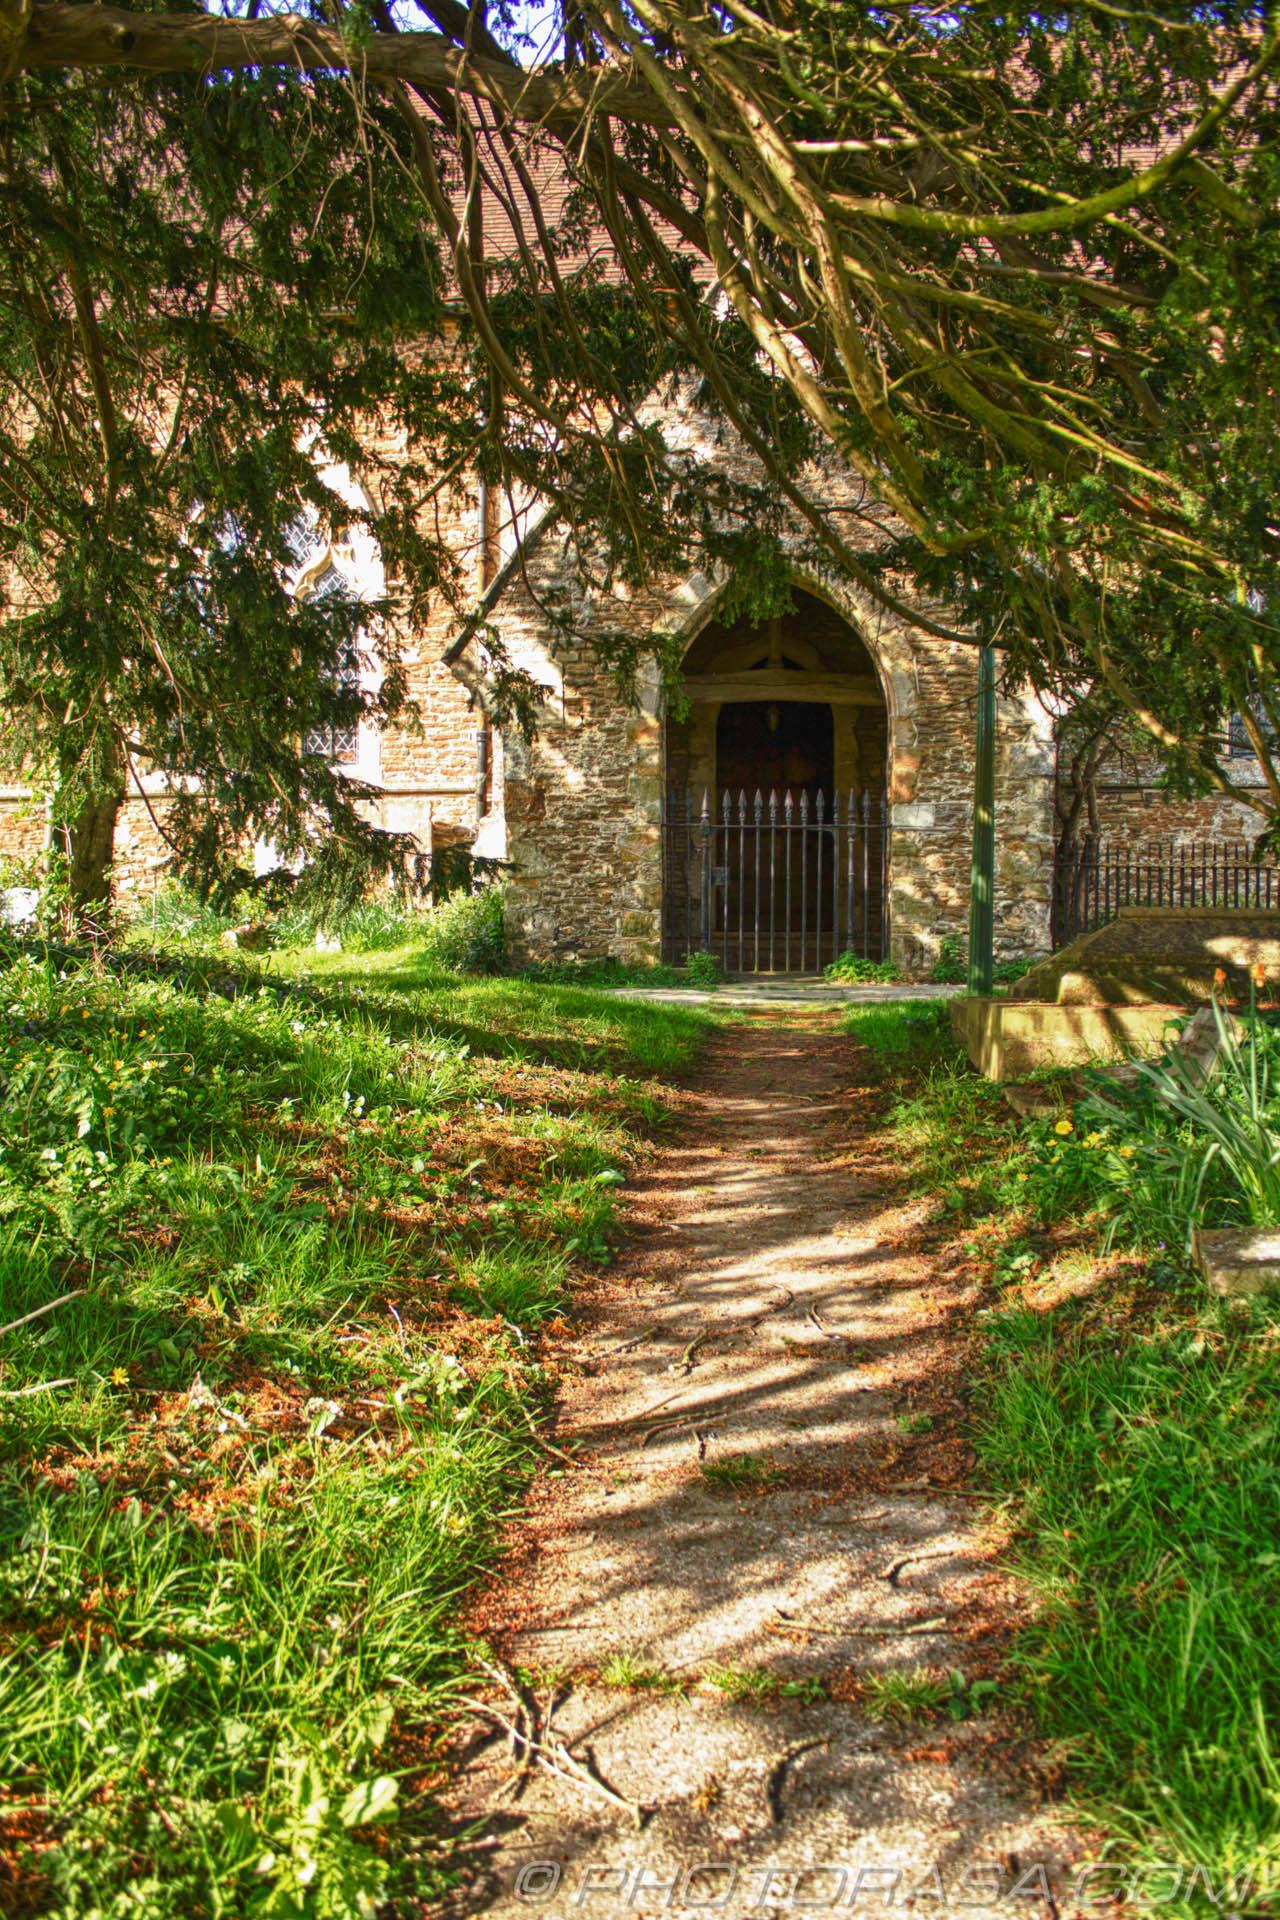 https://photorasa.com/saints-church-staplehurst-kent/path-to-the-church/